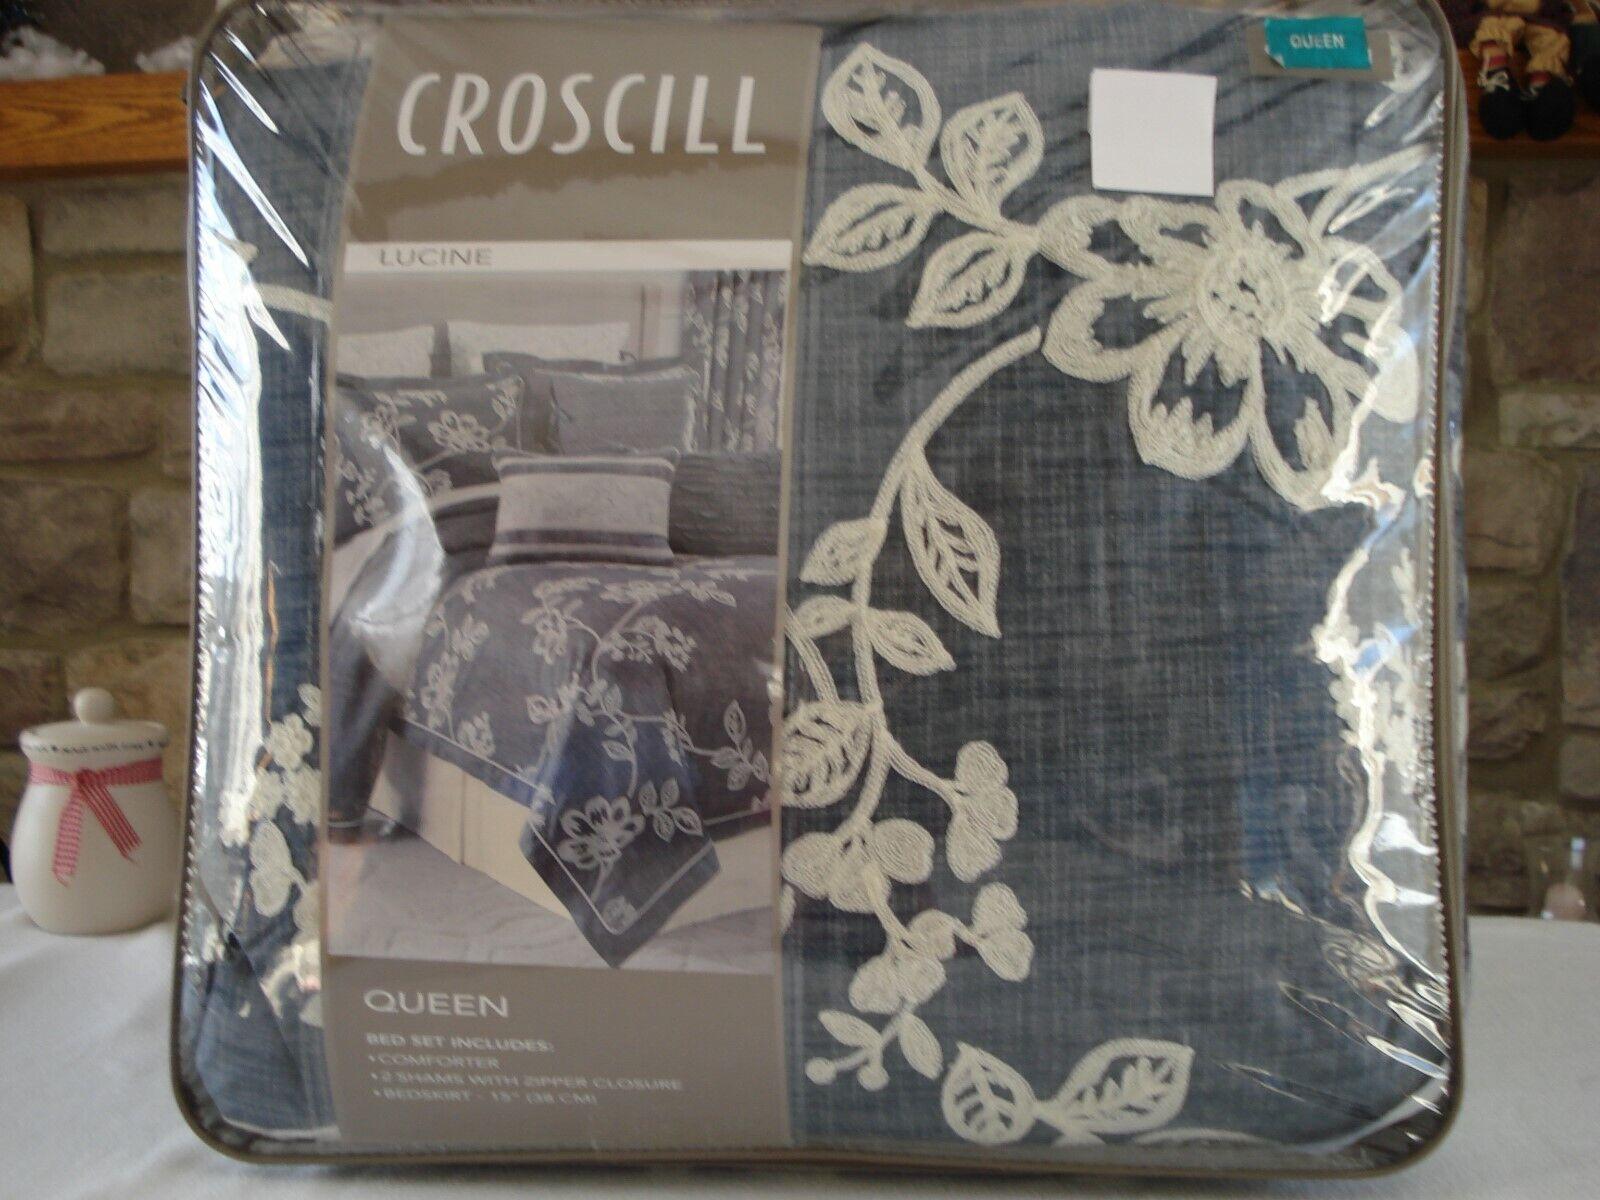 CROSCILL 4-pc QUEEN LUCINE Blau OverGrößed Comforter shams bedskirt set  420